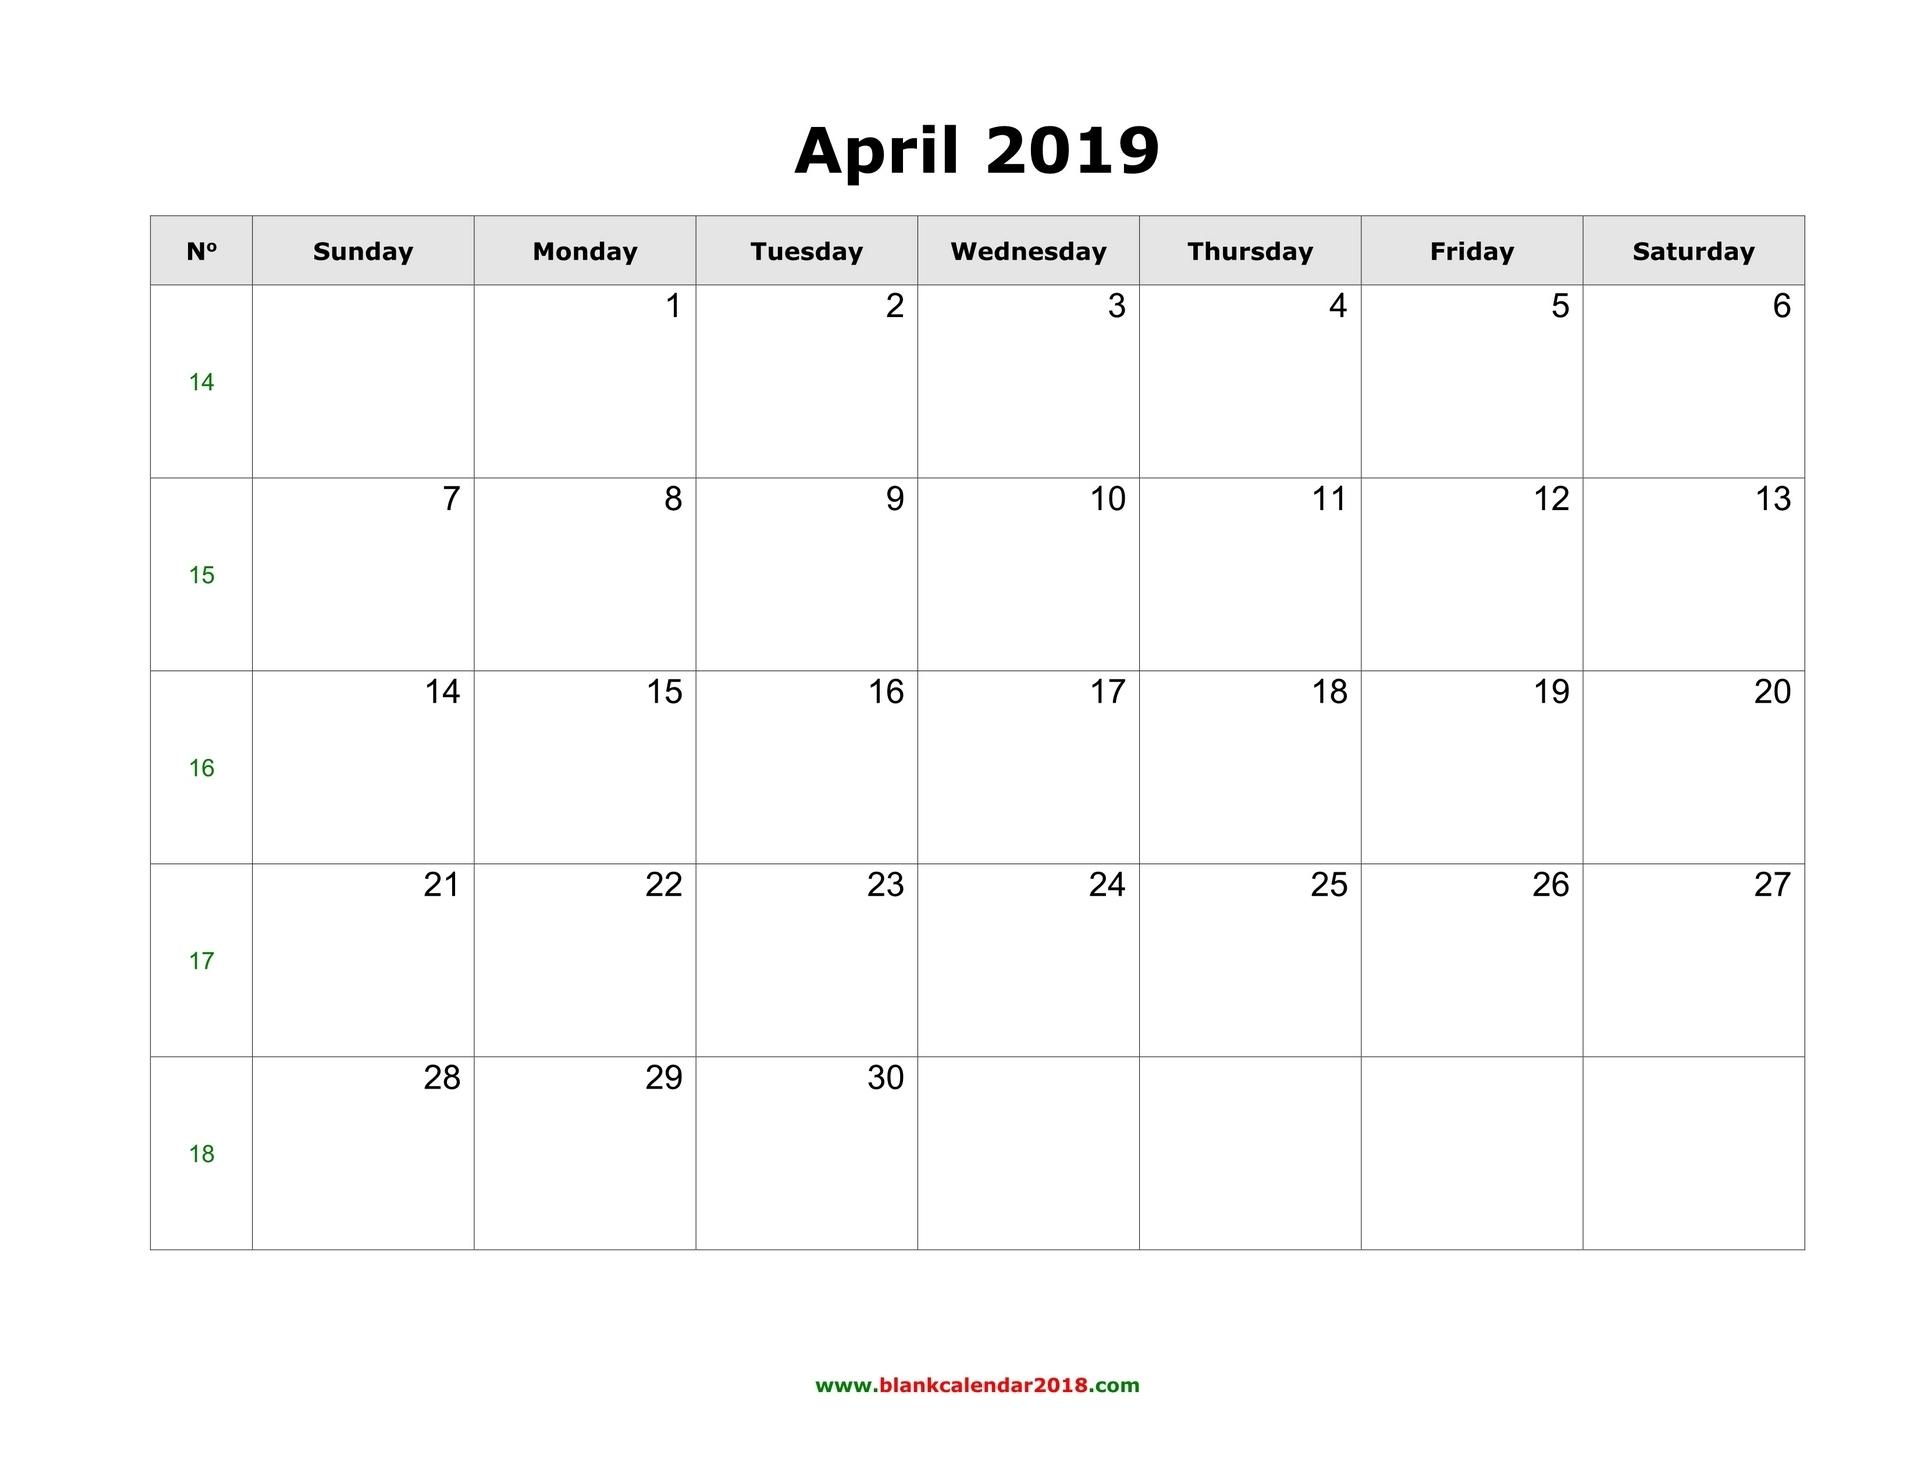 Blank Calendar For April 2019 inside Calendar April 2019 Thru April 2020, Printable